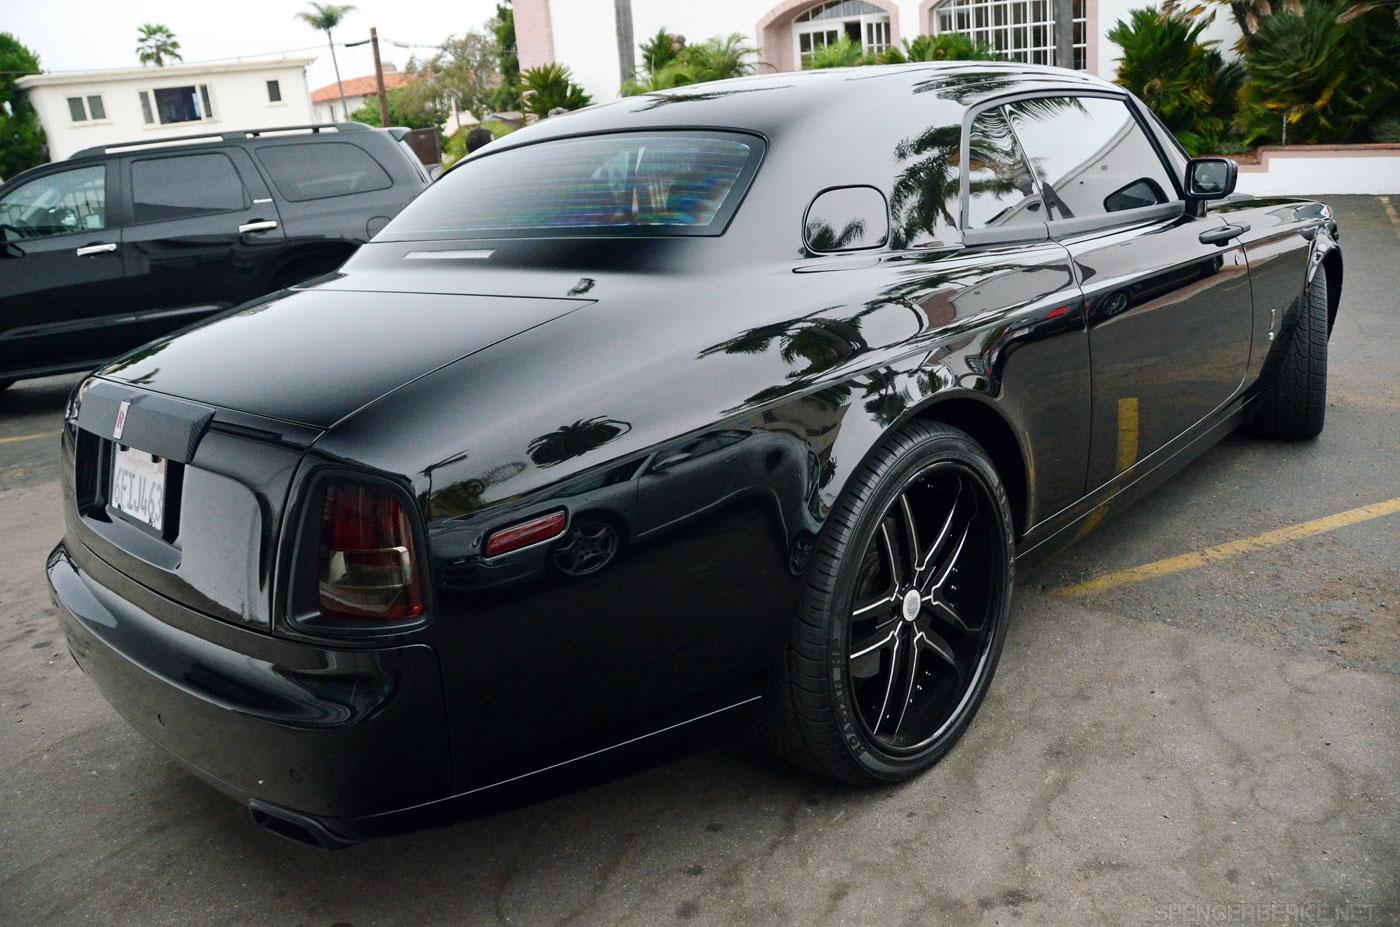 Carbon Fiber Rolls Royce Phantom Coupe Extravaganzi